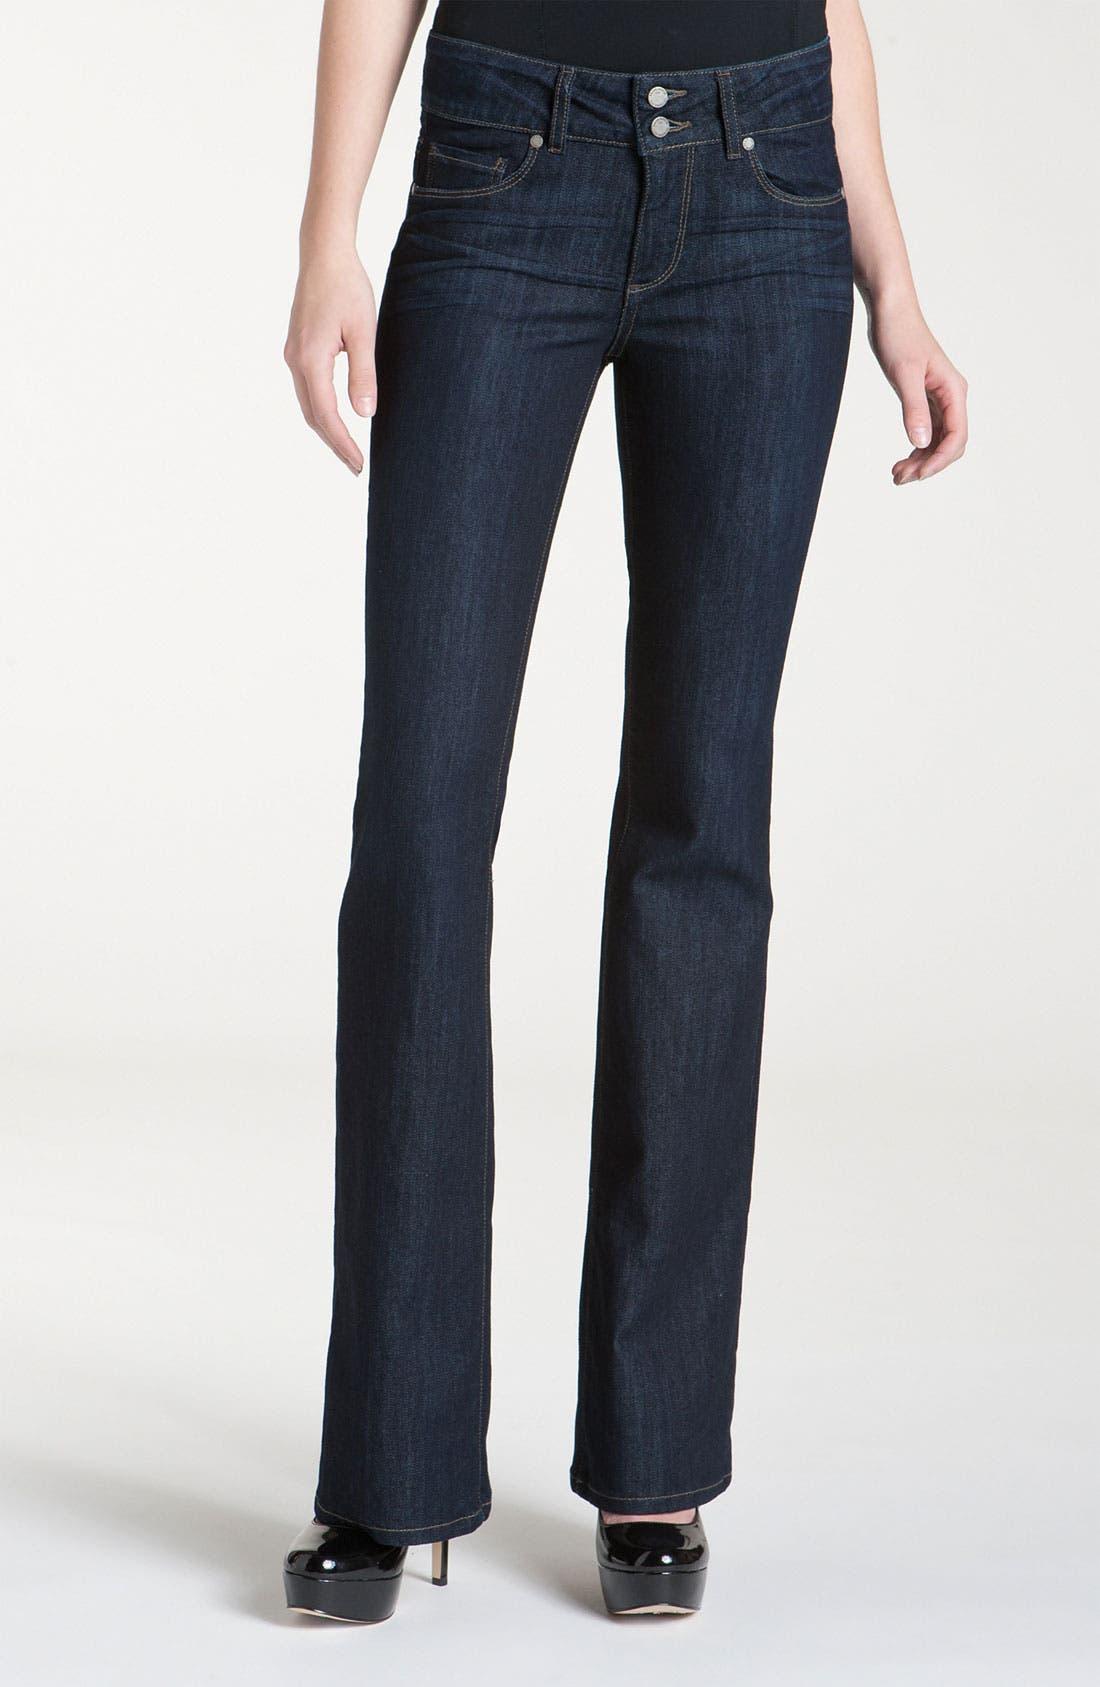 Alternate Image 1 Selected - Paige Denim 'Hidden Hills' Bootcut Jeans (Dream)